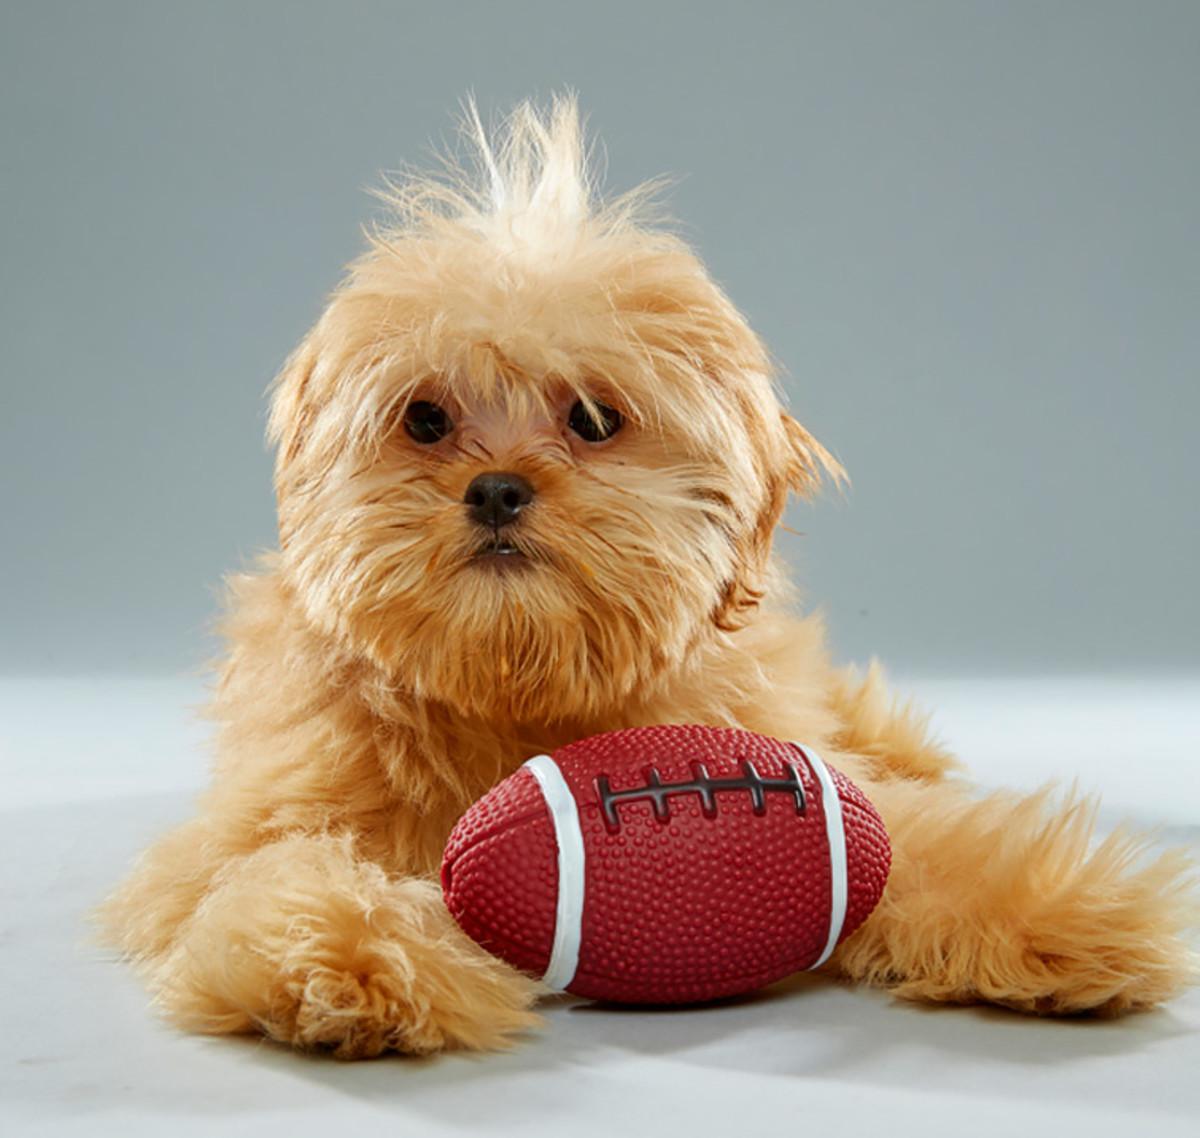 rory_florida-little-dog-rescue_team-fluff_2.jpg